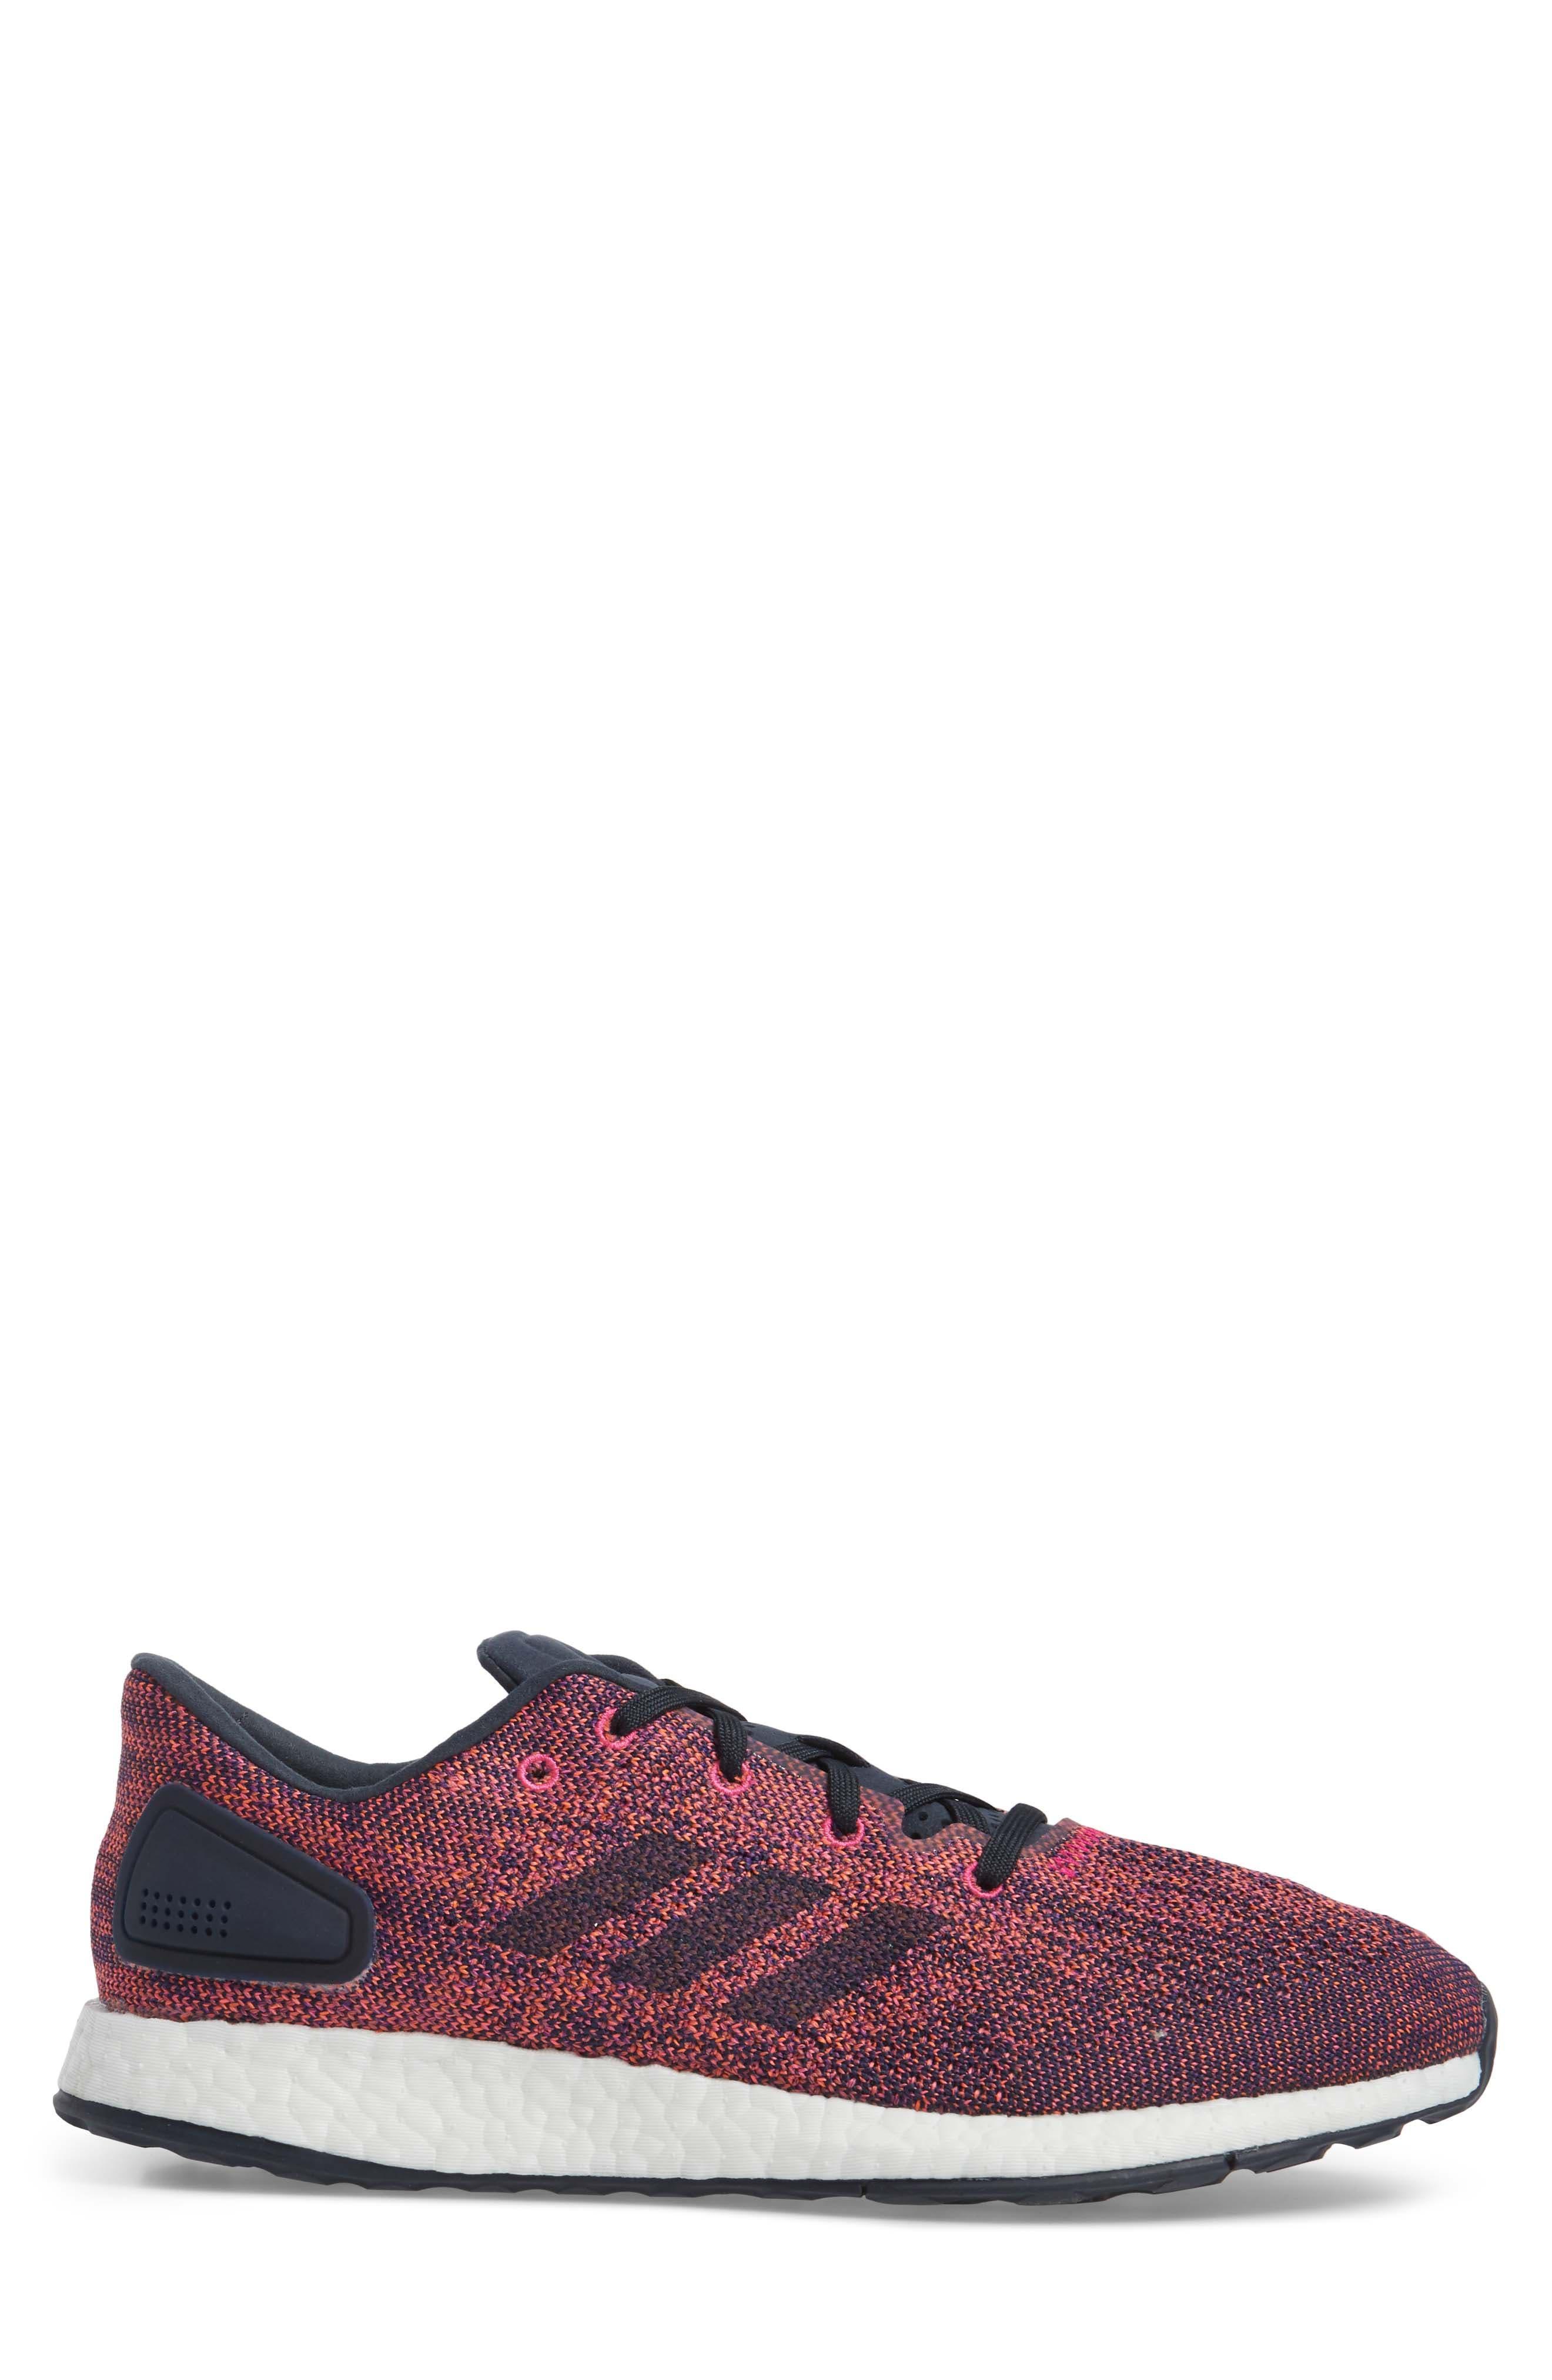 PureBoost DPR LTD Running Shoe,                             Alternate thumbnail 3, color,